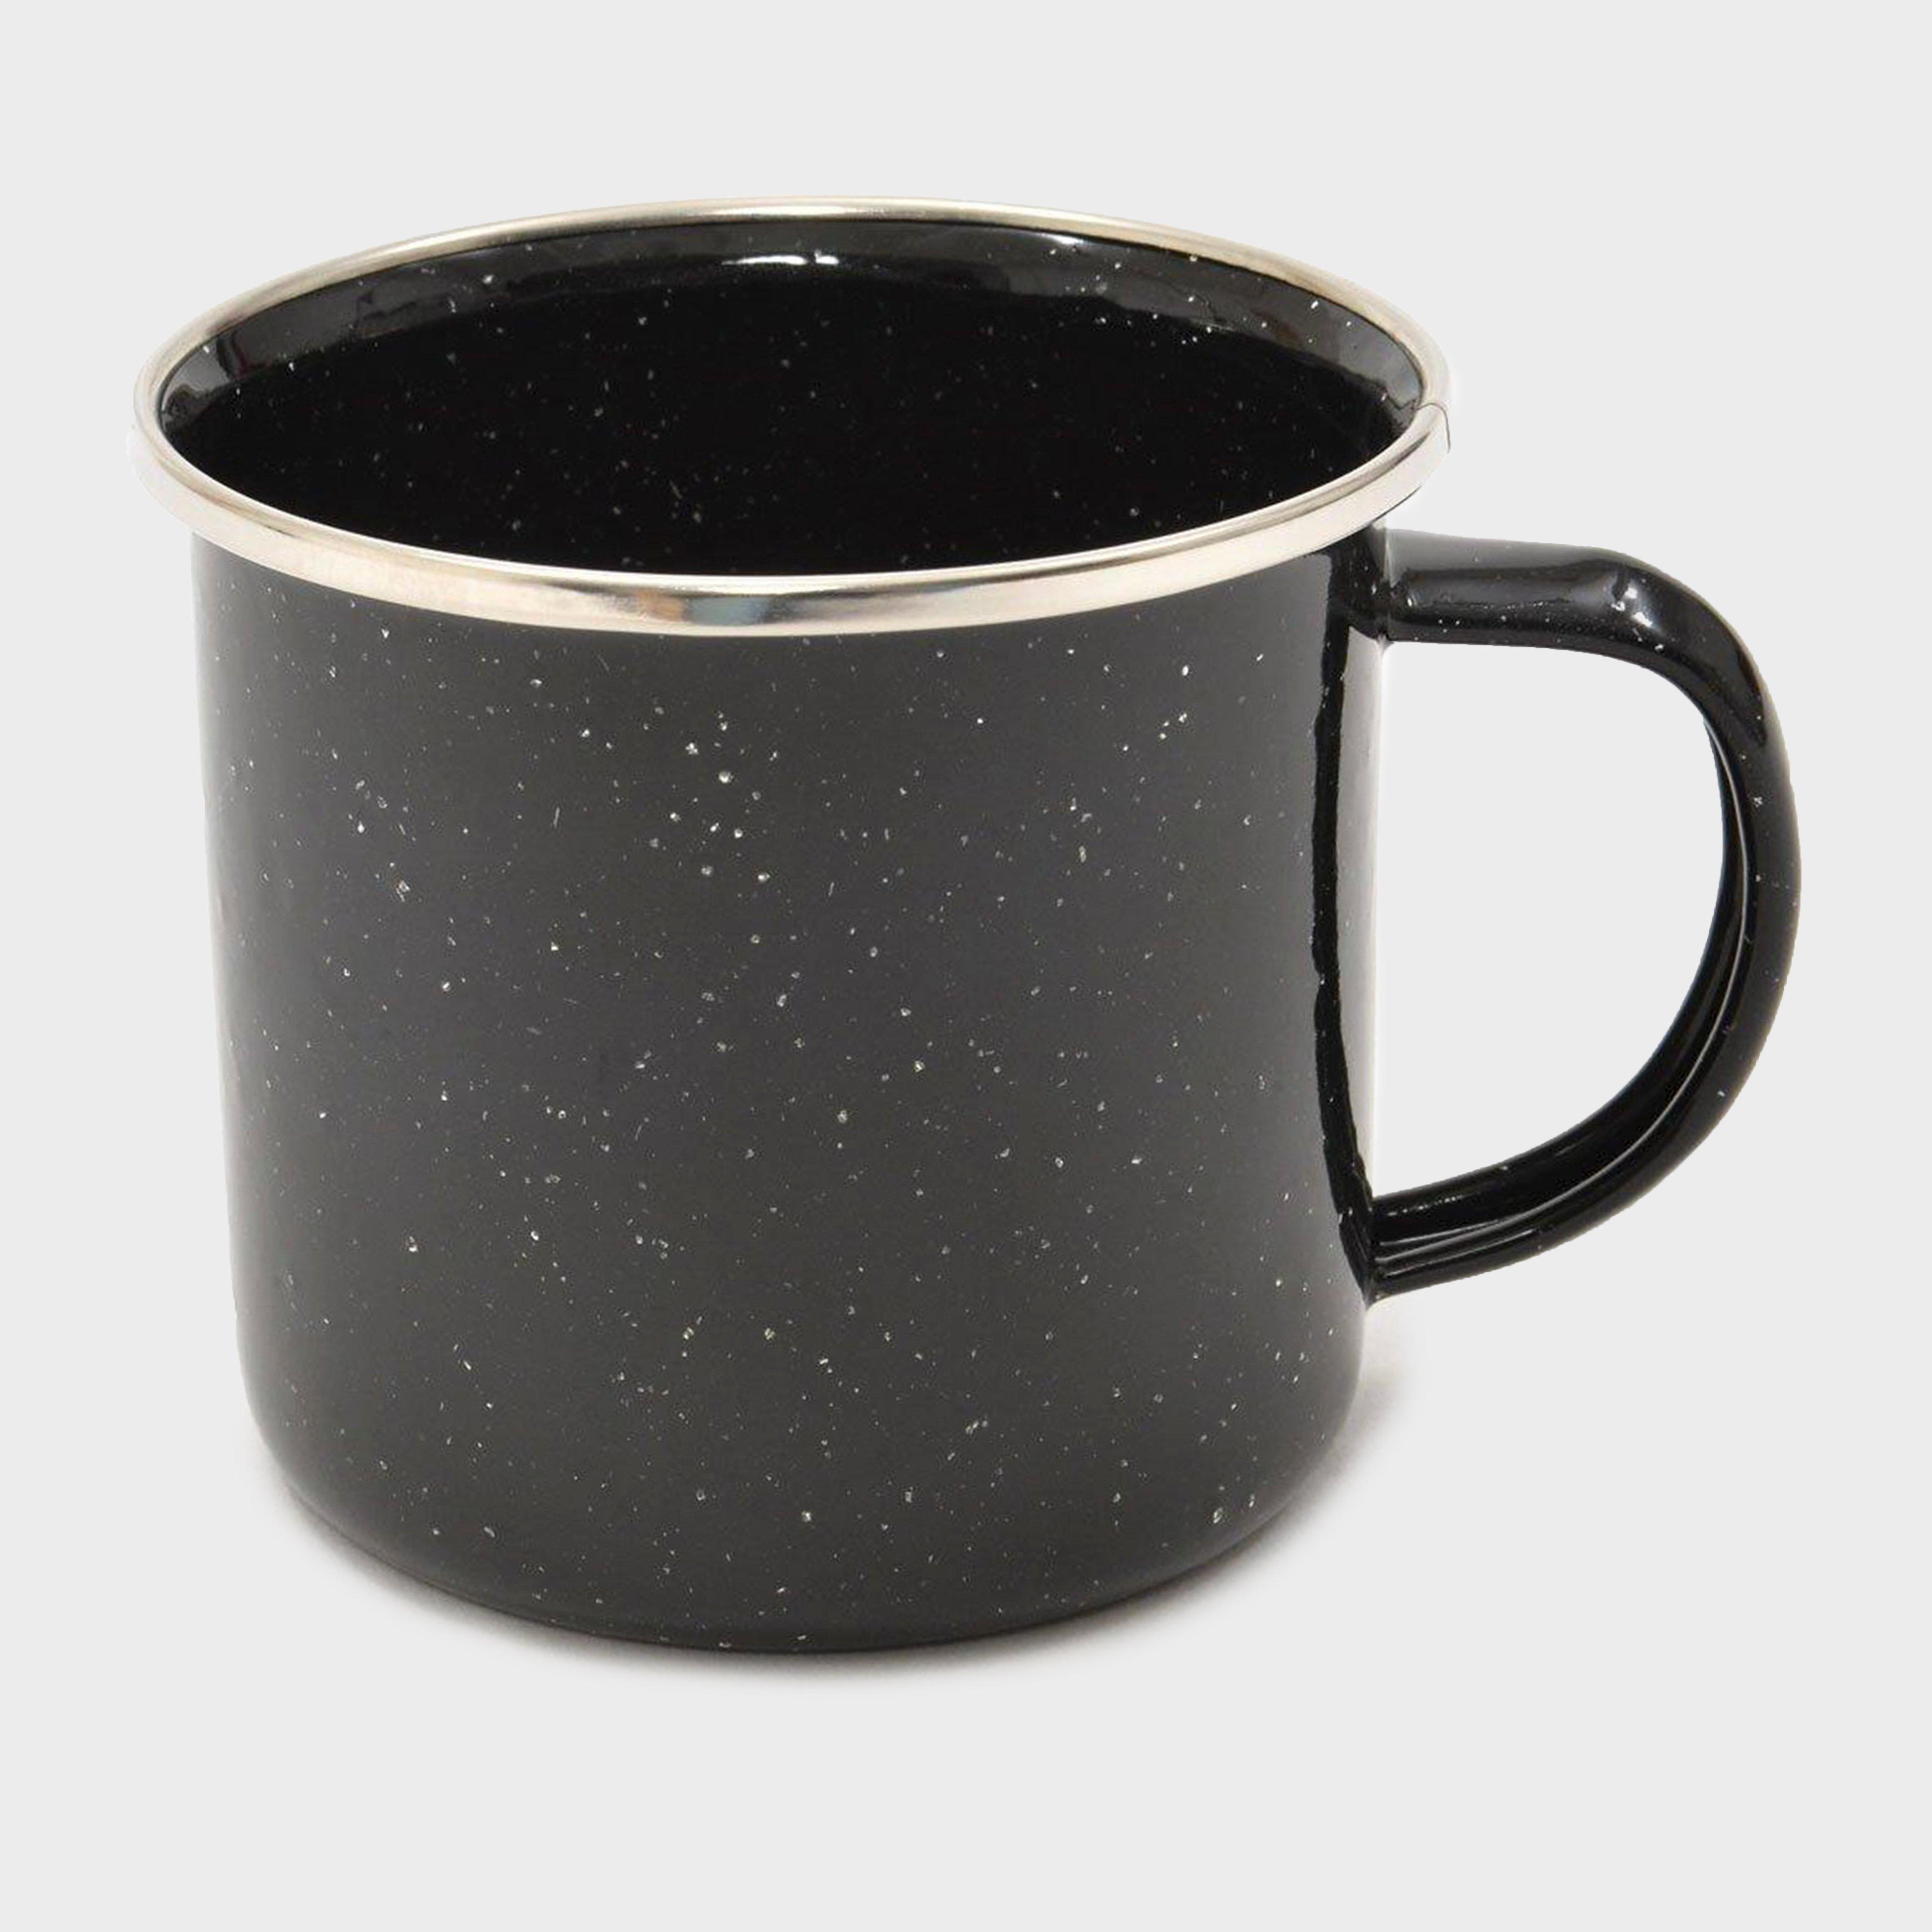 Hi-gear Enamel Cup - Black/12oz  Black/12oz